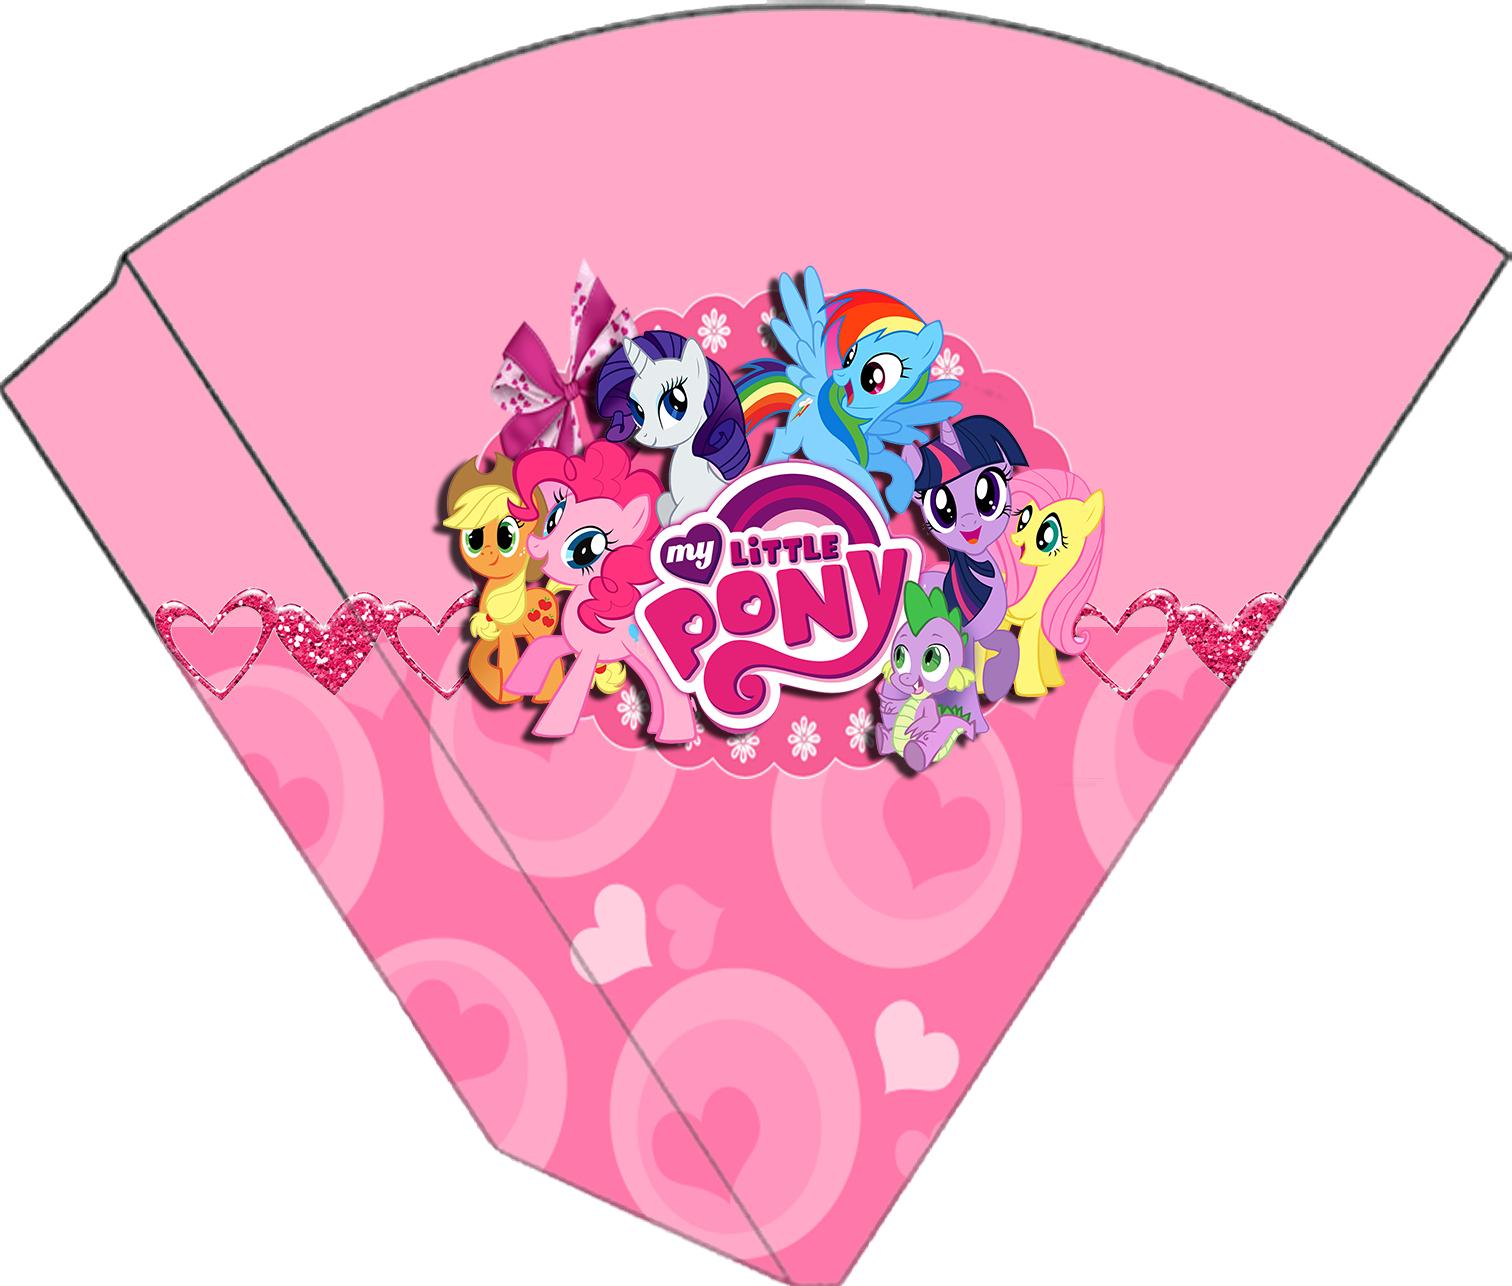 My Little Pony Free Printable Kit. - Oh My Fiesta! For Geeks - My Little Pony Free Printables